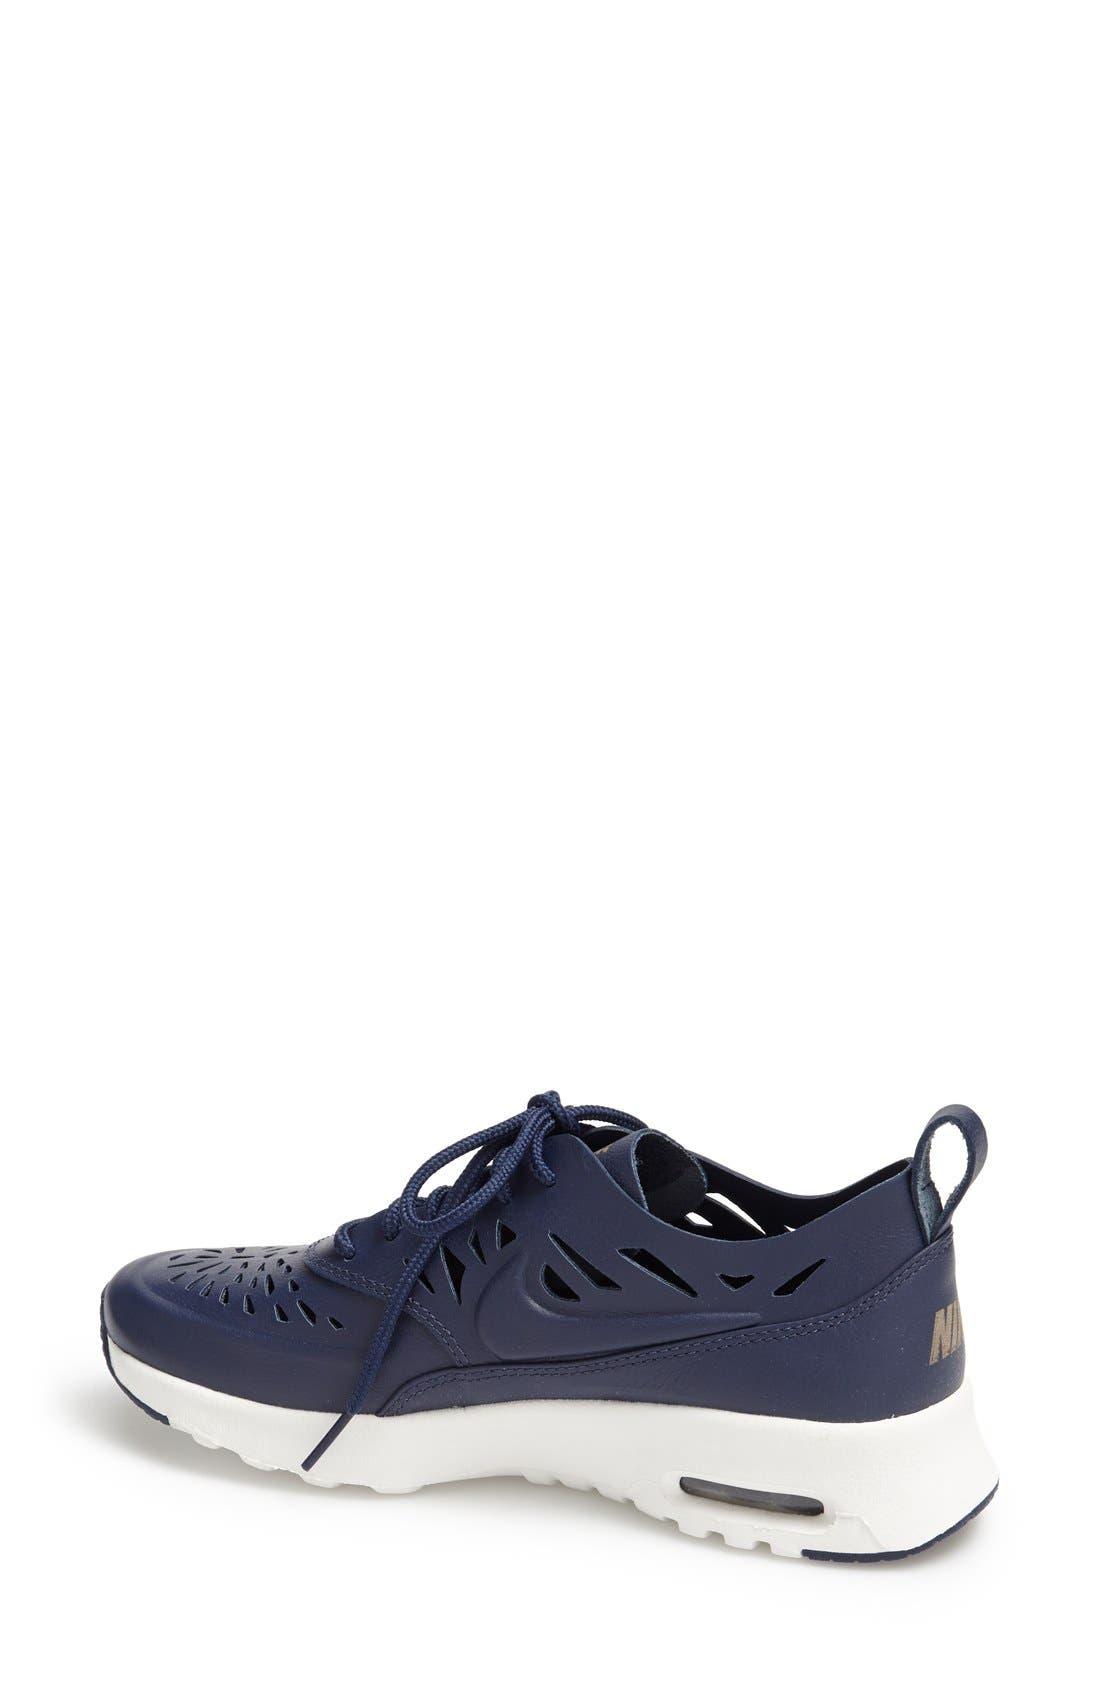 Alternate Image 2  - Nike 'Air Max Thea Joli' Sneaker (Women)